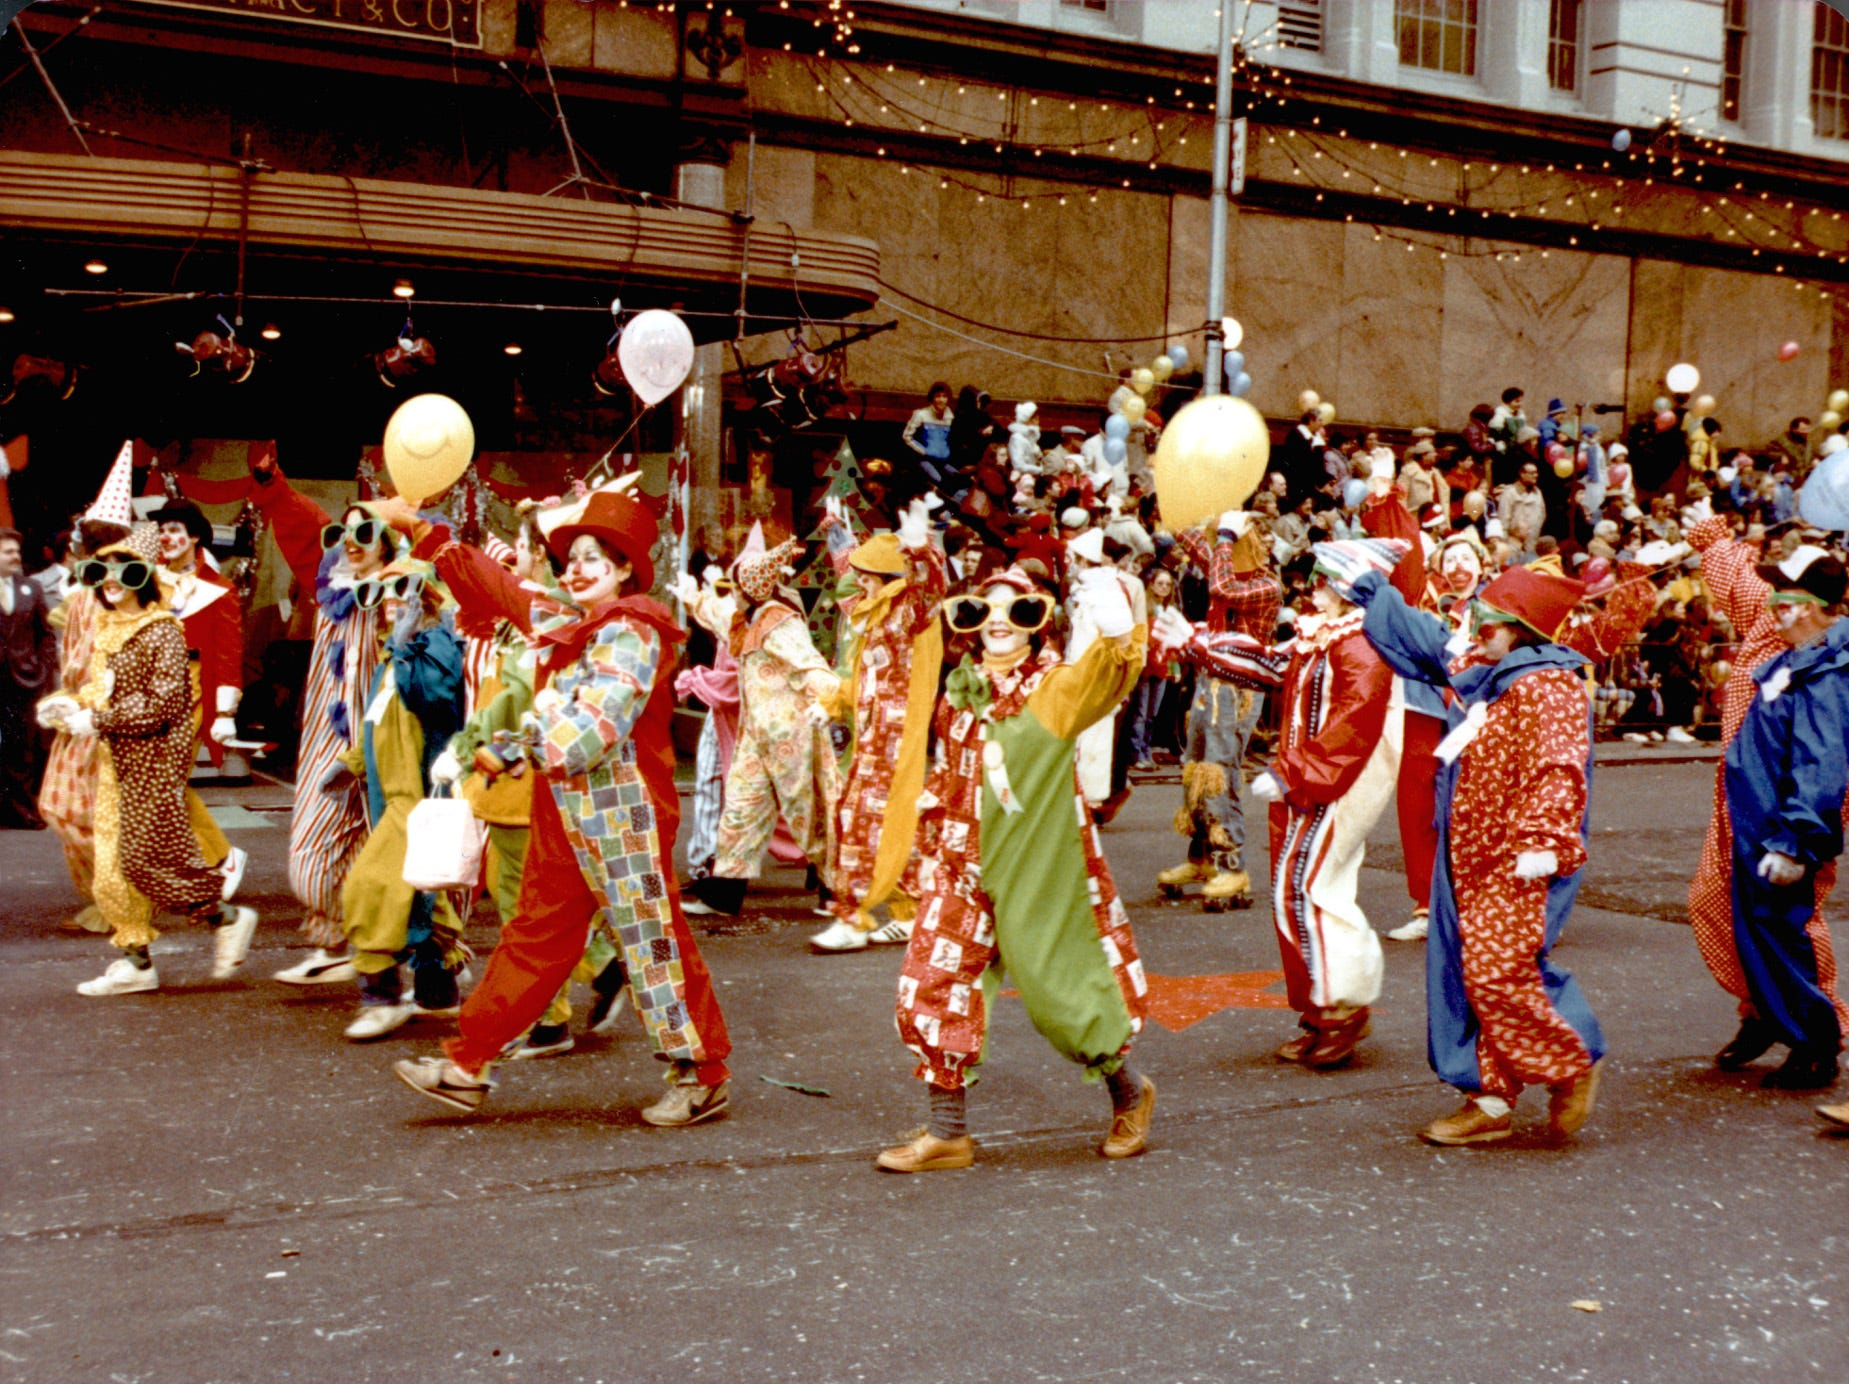 Volunteer clowns  in the 1979 Macy's Thanksgiving parade. (Gannett News Service/Macy's New York)